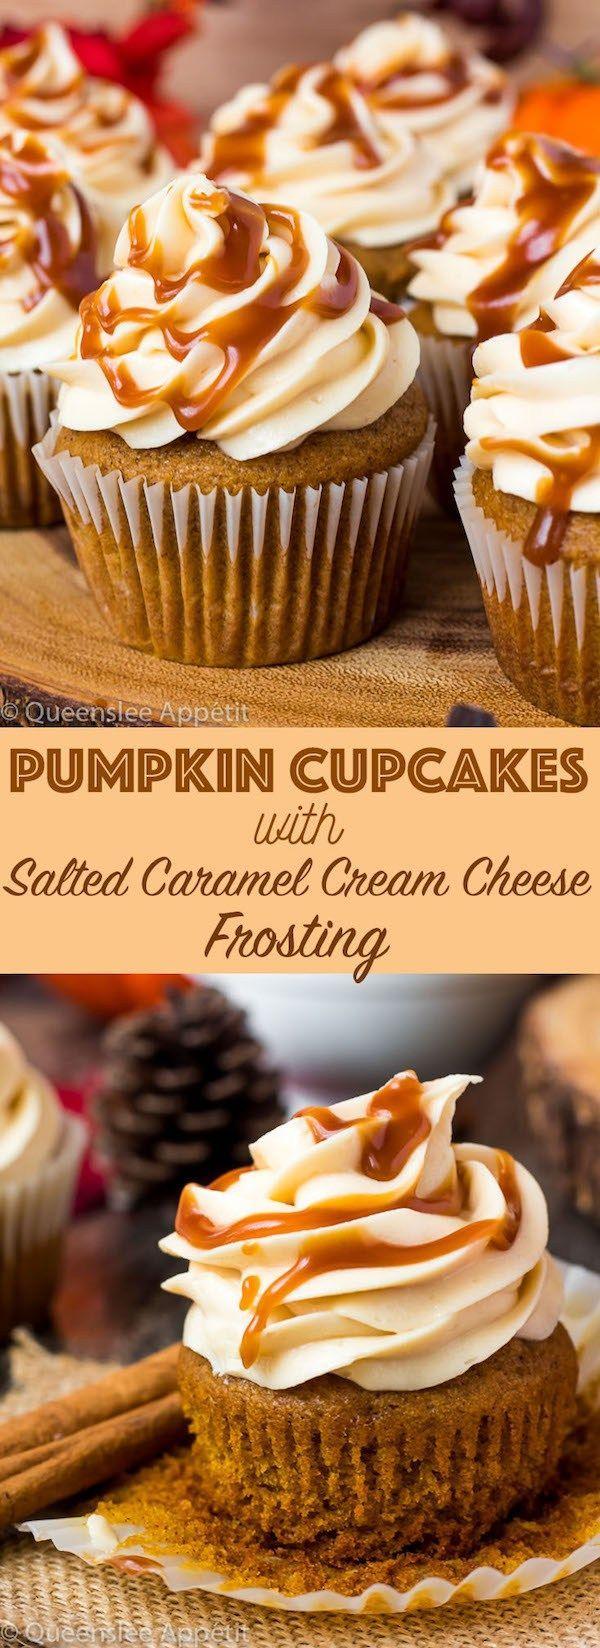 Kürbis-Cupcakes mit gesalzenem Karamell-Frischkäse-Zuckerguss - #gesalzenem #KaramellFrischkäseZuckerguss #KürbisCupcakes #mit #creamcheeserecipes